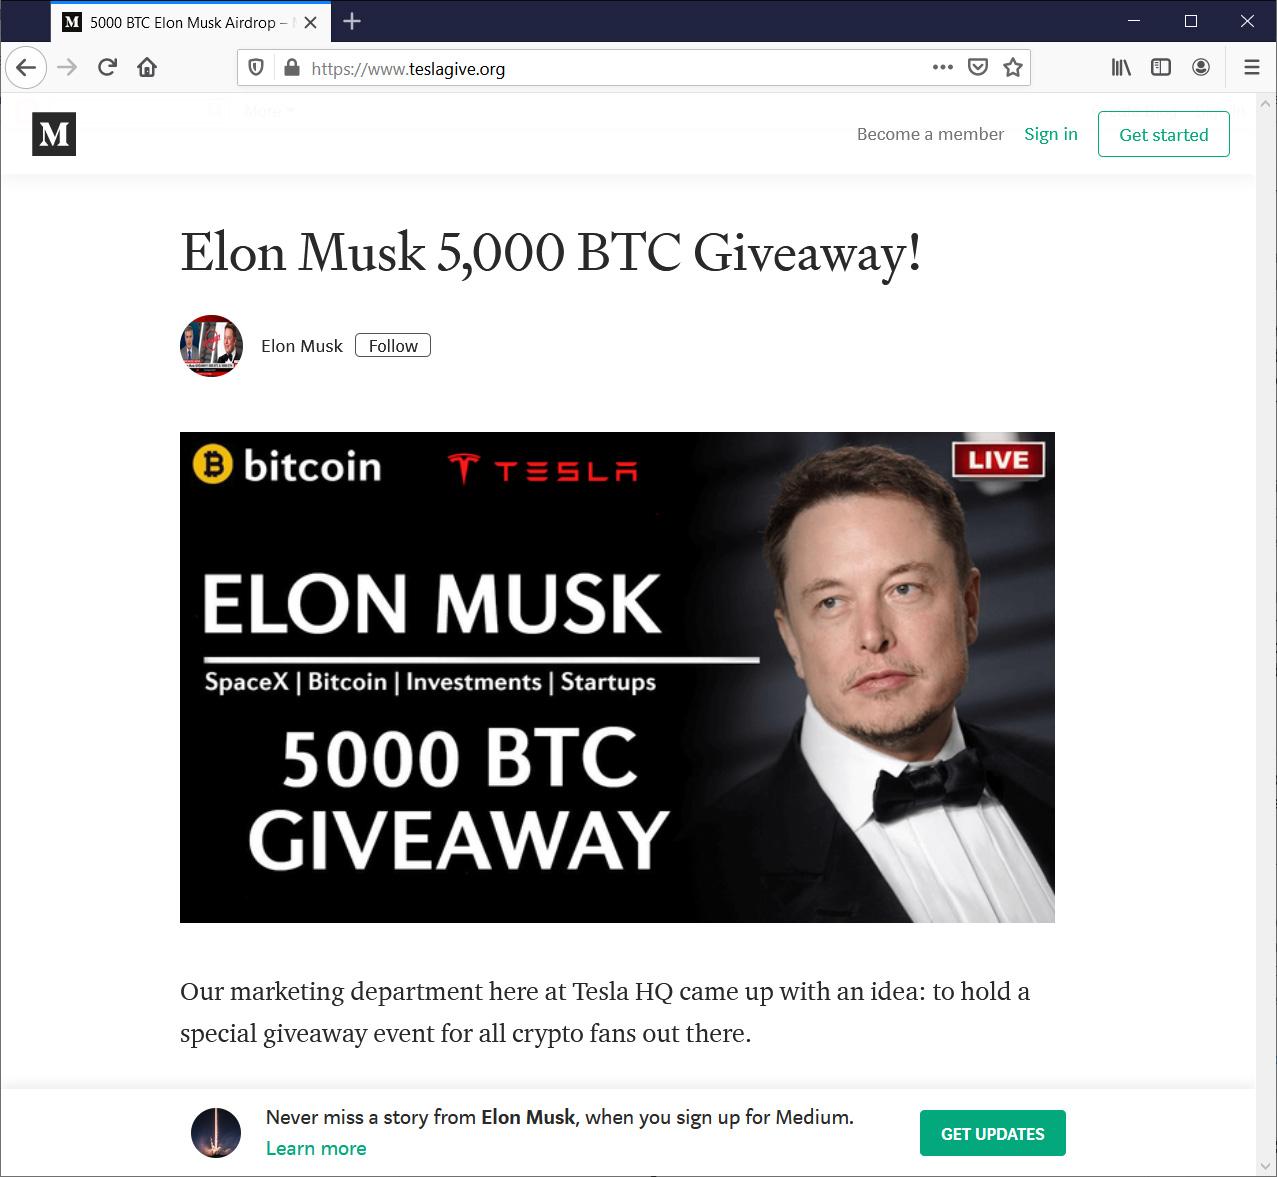 Fake Elon Musk Medium post